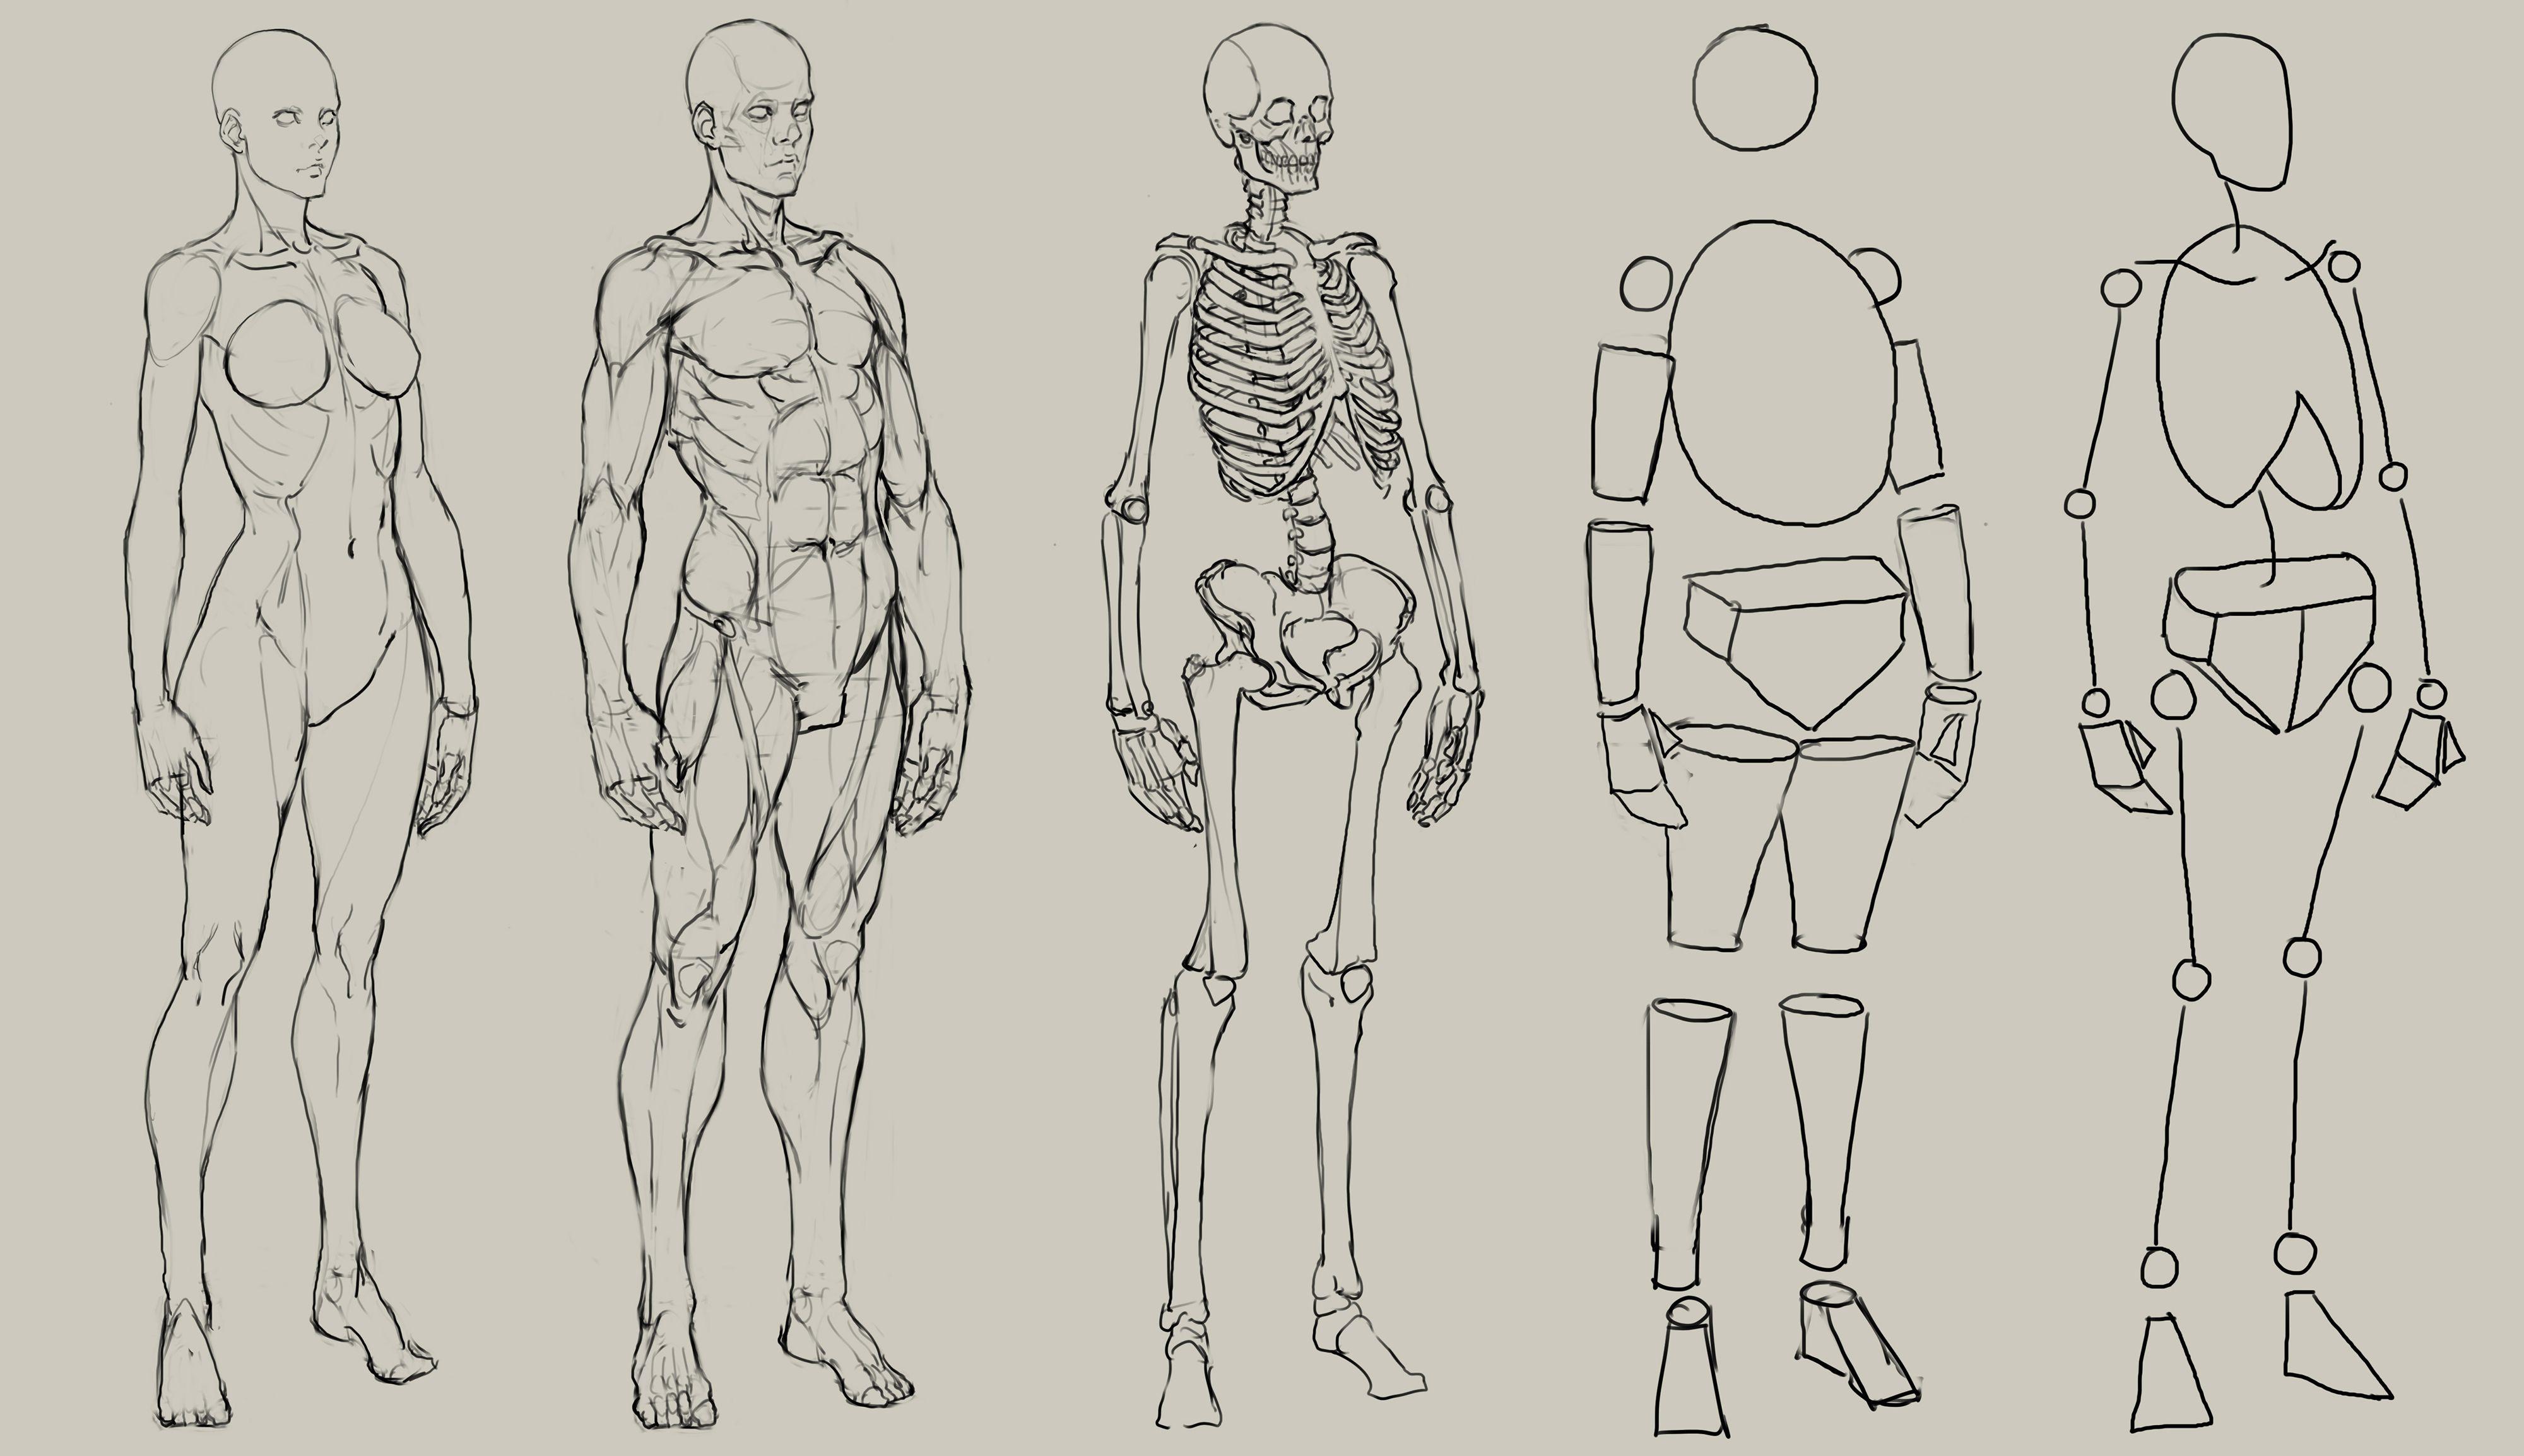 man body drawing - HD1920×1108